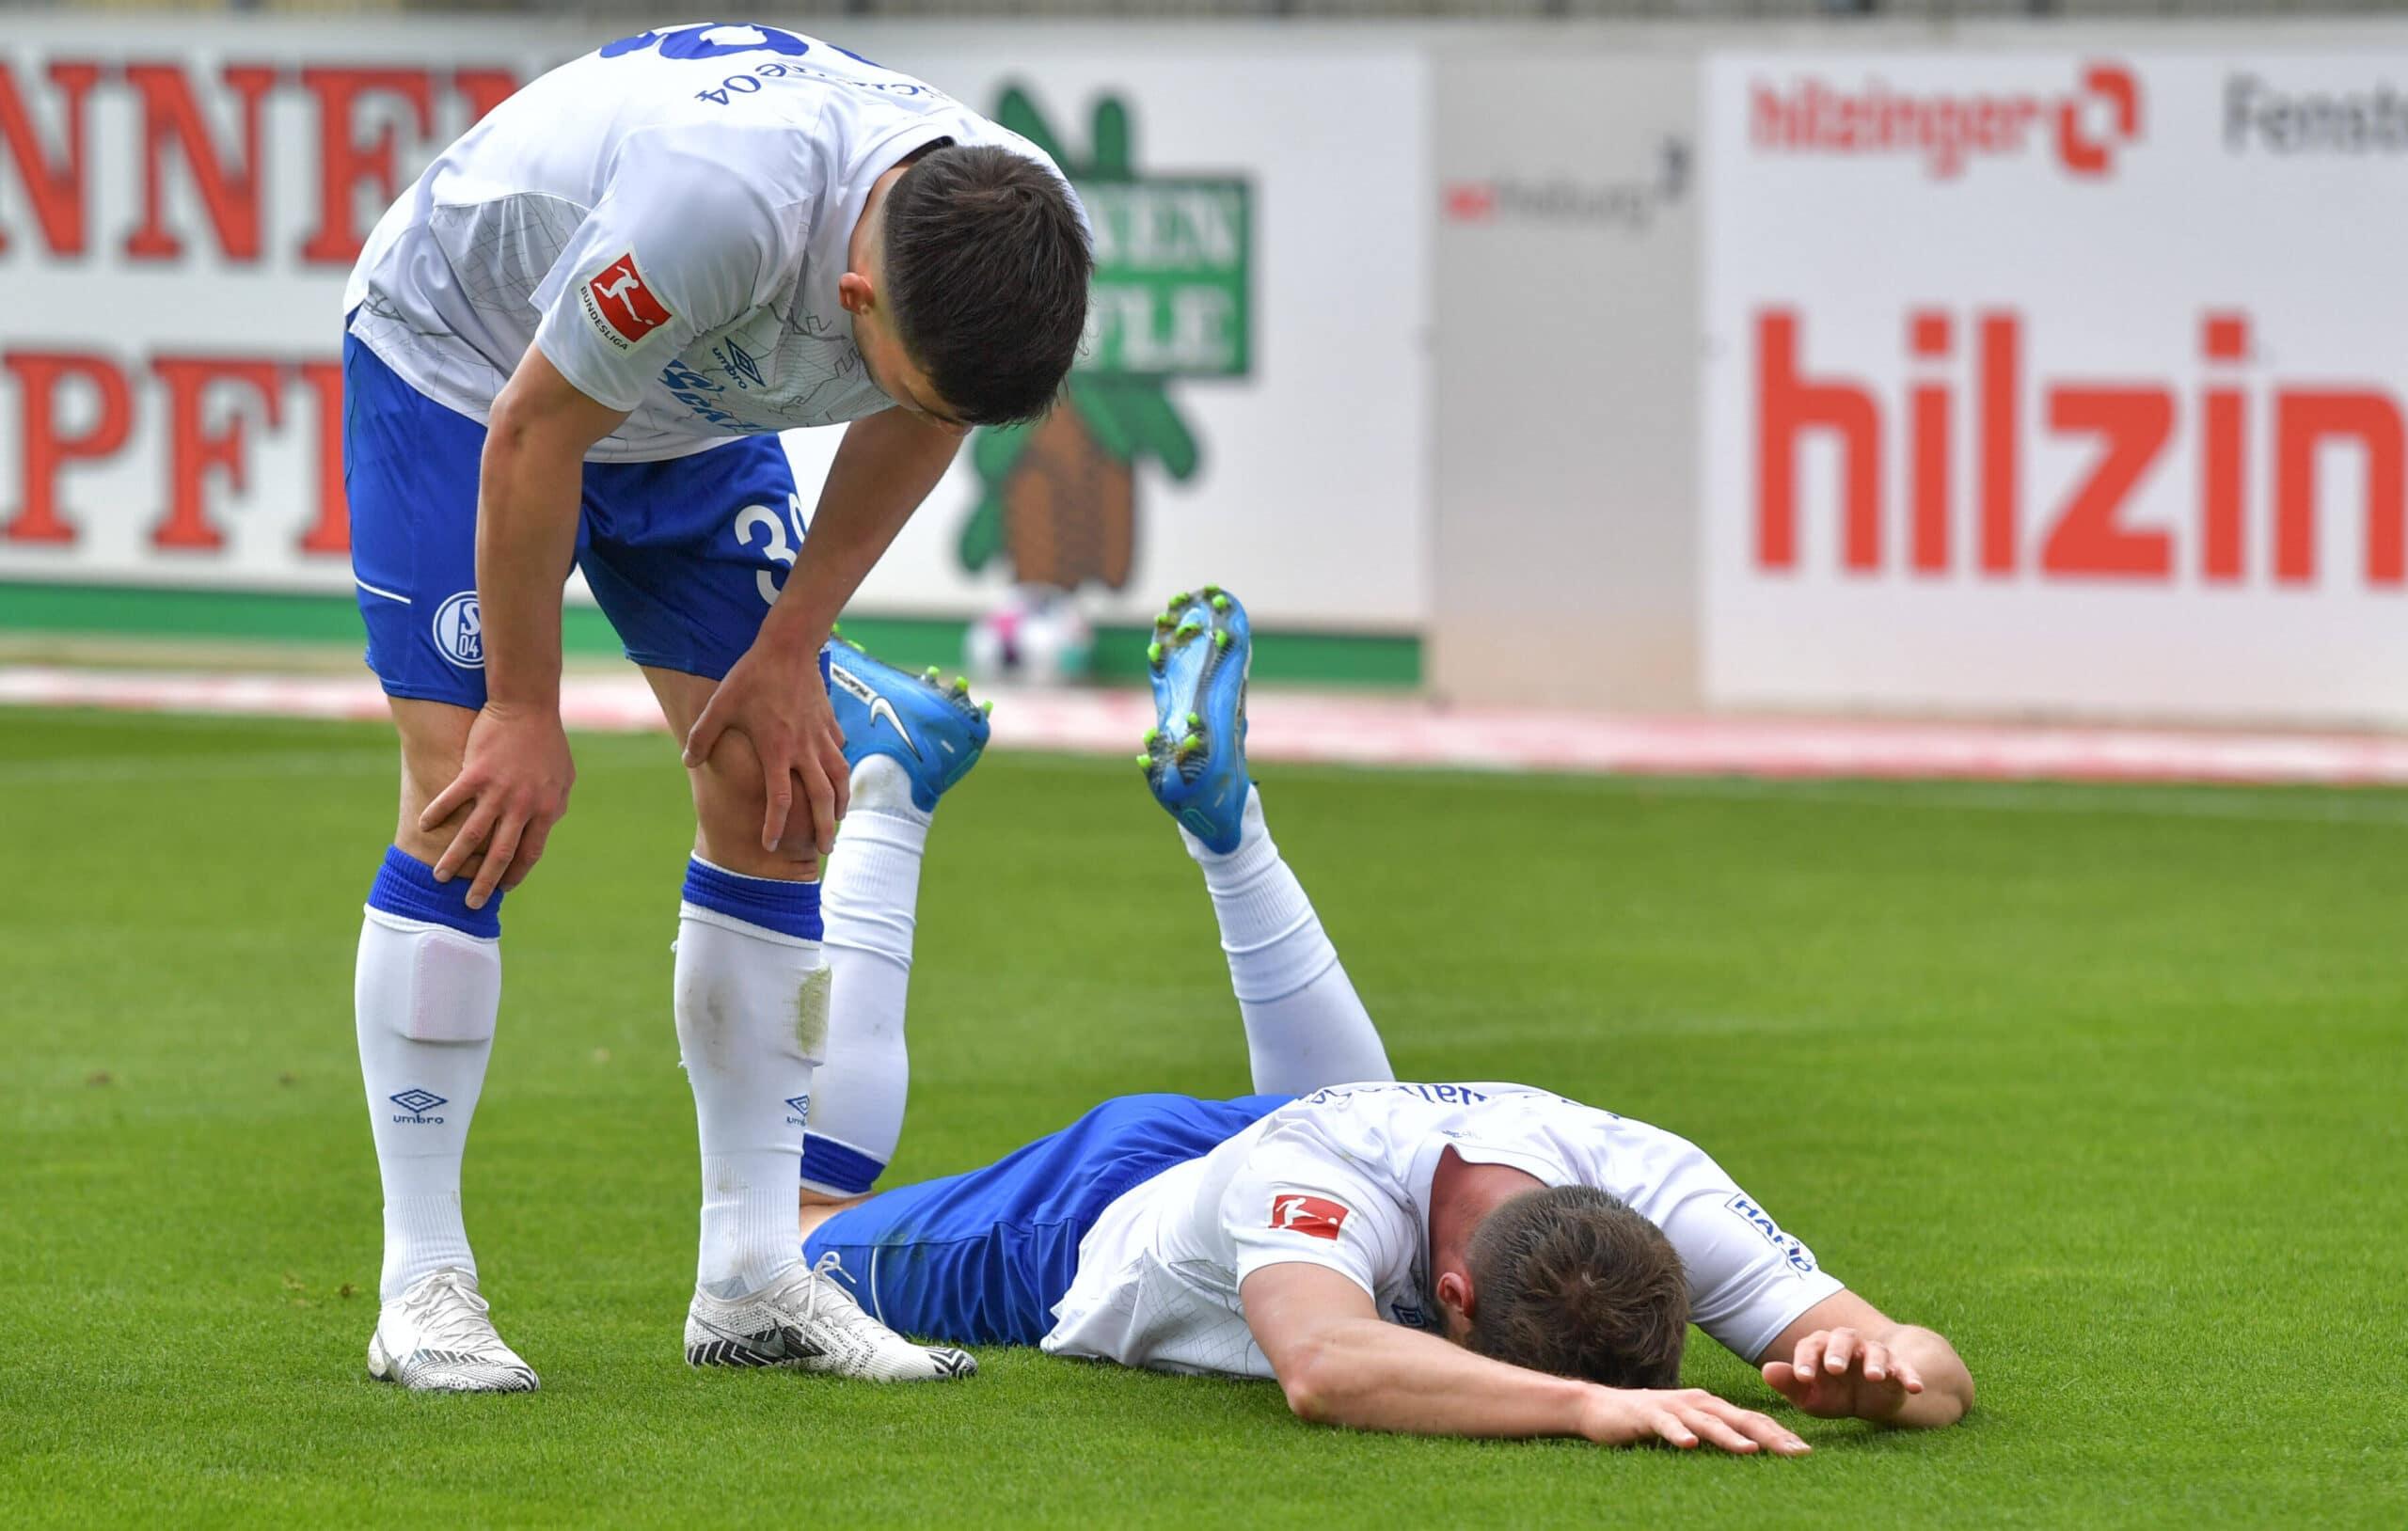 OFFICIEL : Schalke04 relégué en 2.Bundesliga !